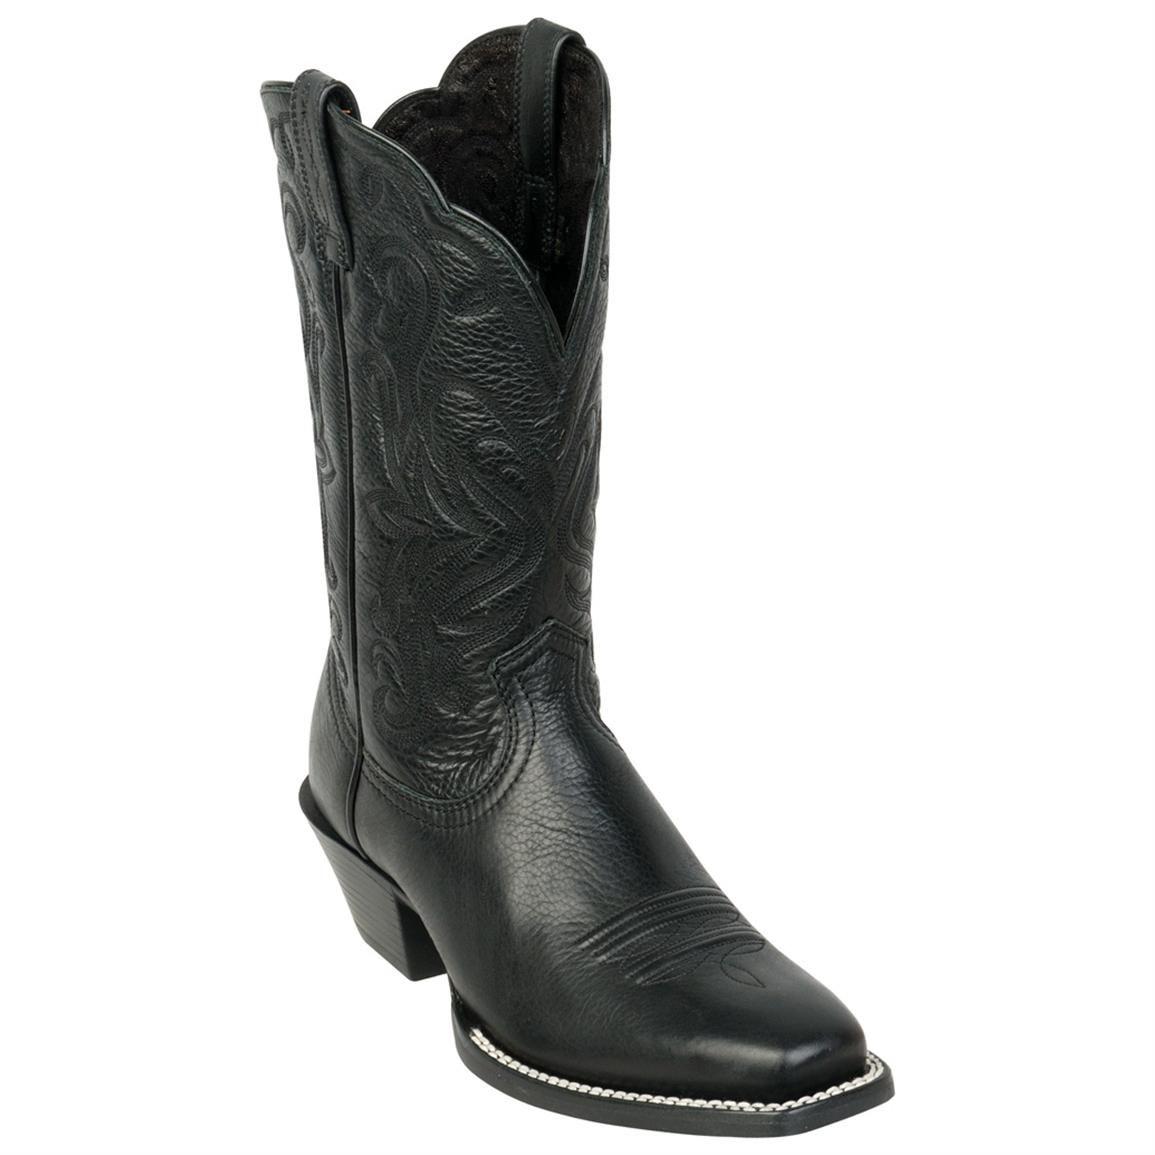 19df26b2466 Women's Ariat® 11 inch Legend Western Boots, Black Deertan ...